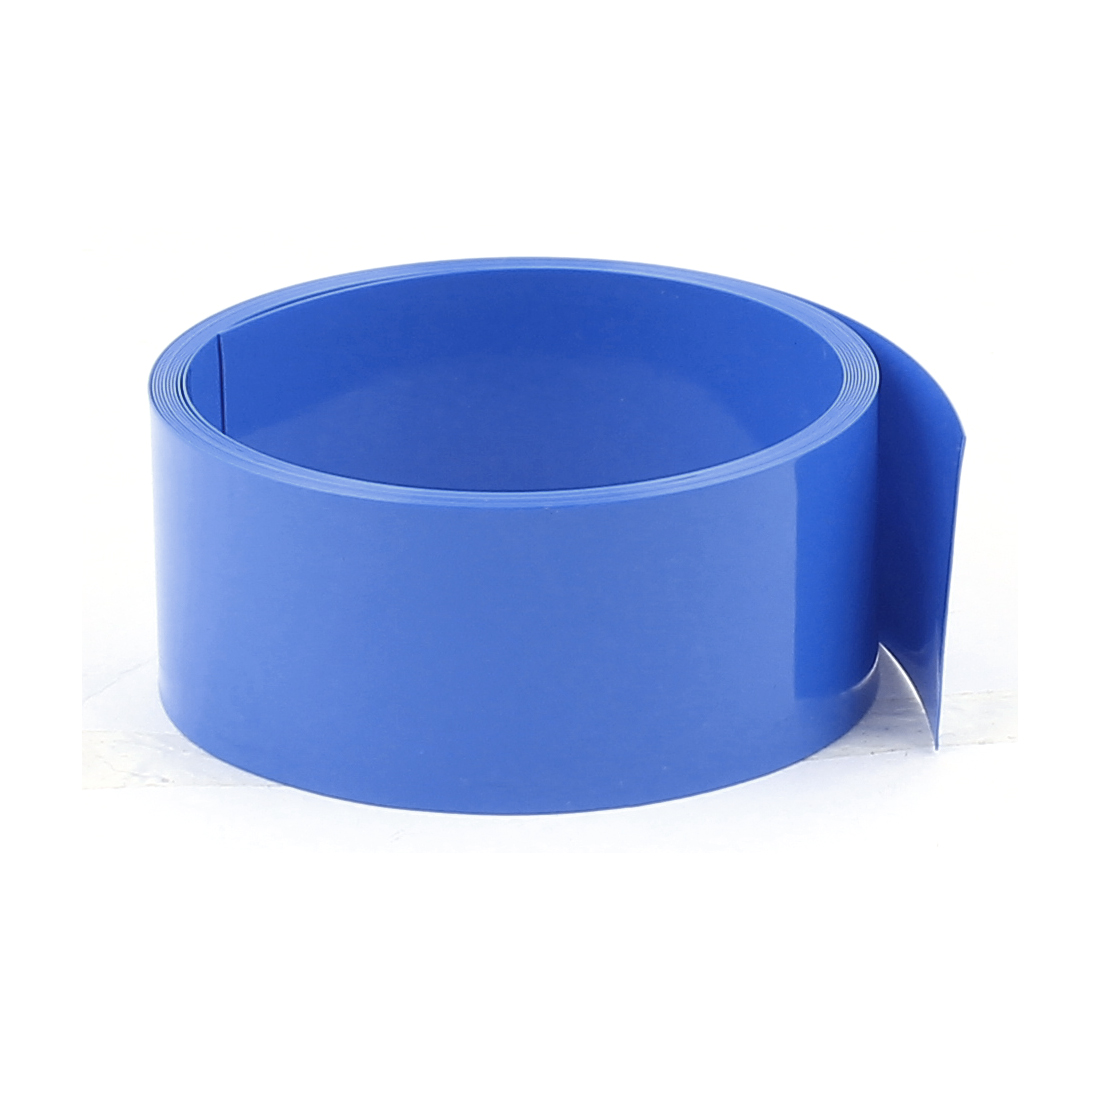 6.6ft 29.5mm Flat 19mm Dia PVC Heat Shrink Tubing Blue for 18650 Battery